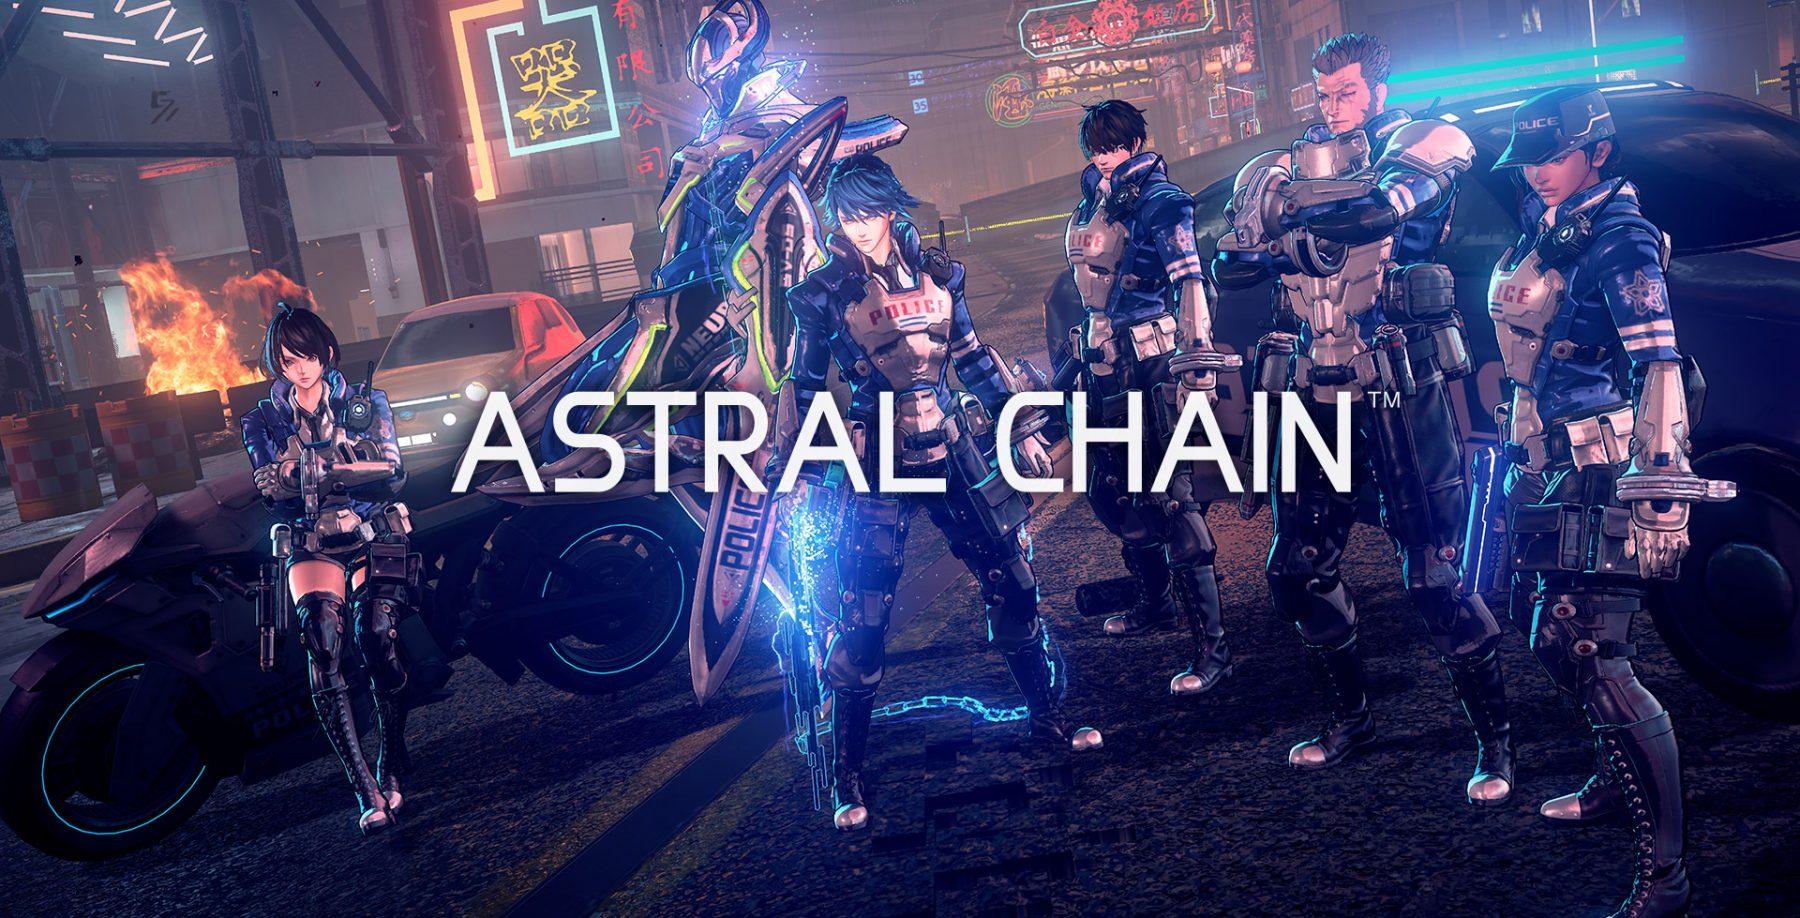 Ранние концепты Легионов из Astral Chain